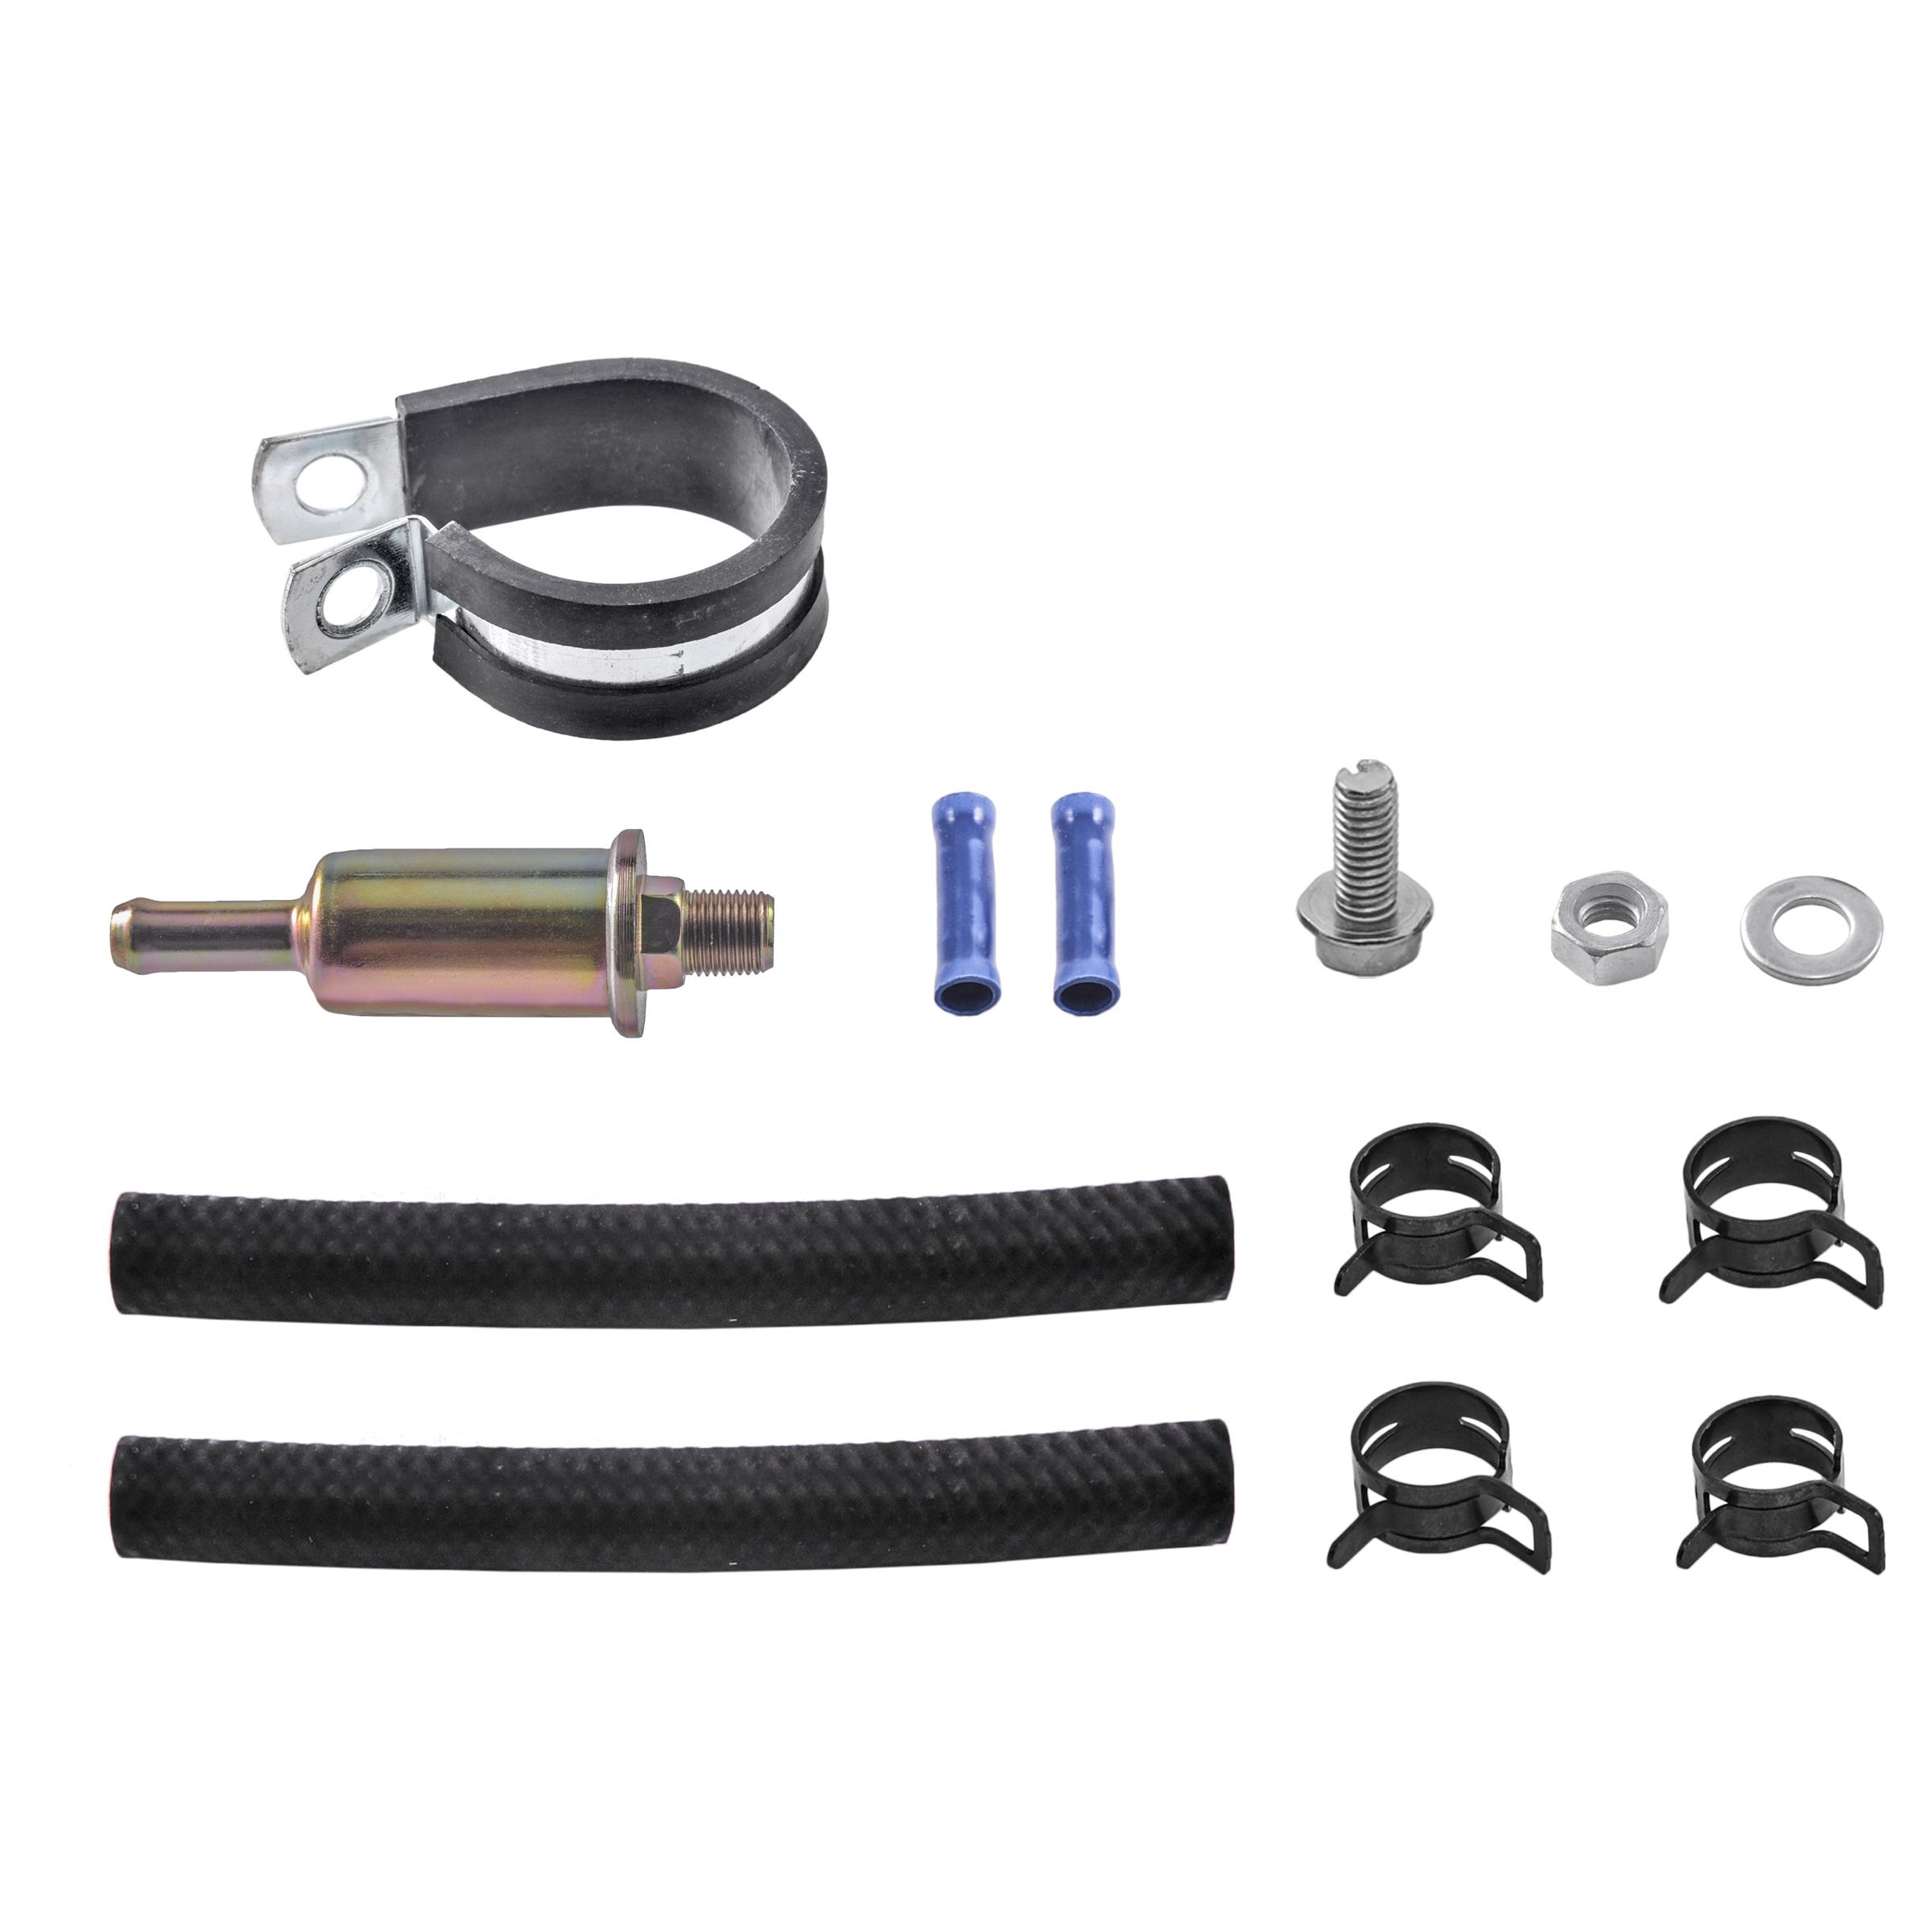 E8016S SP8016 Electric Fuel Pump-Pump Kit US Motor Works USEP8016S